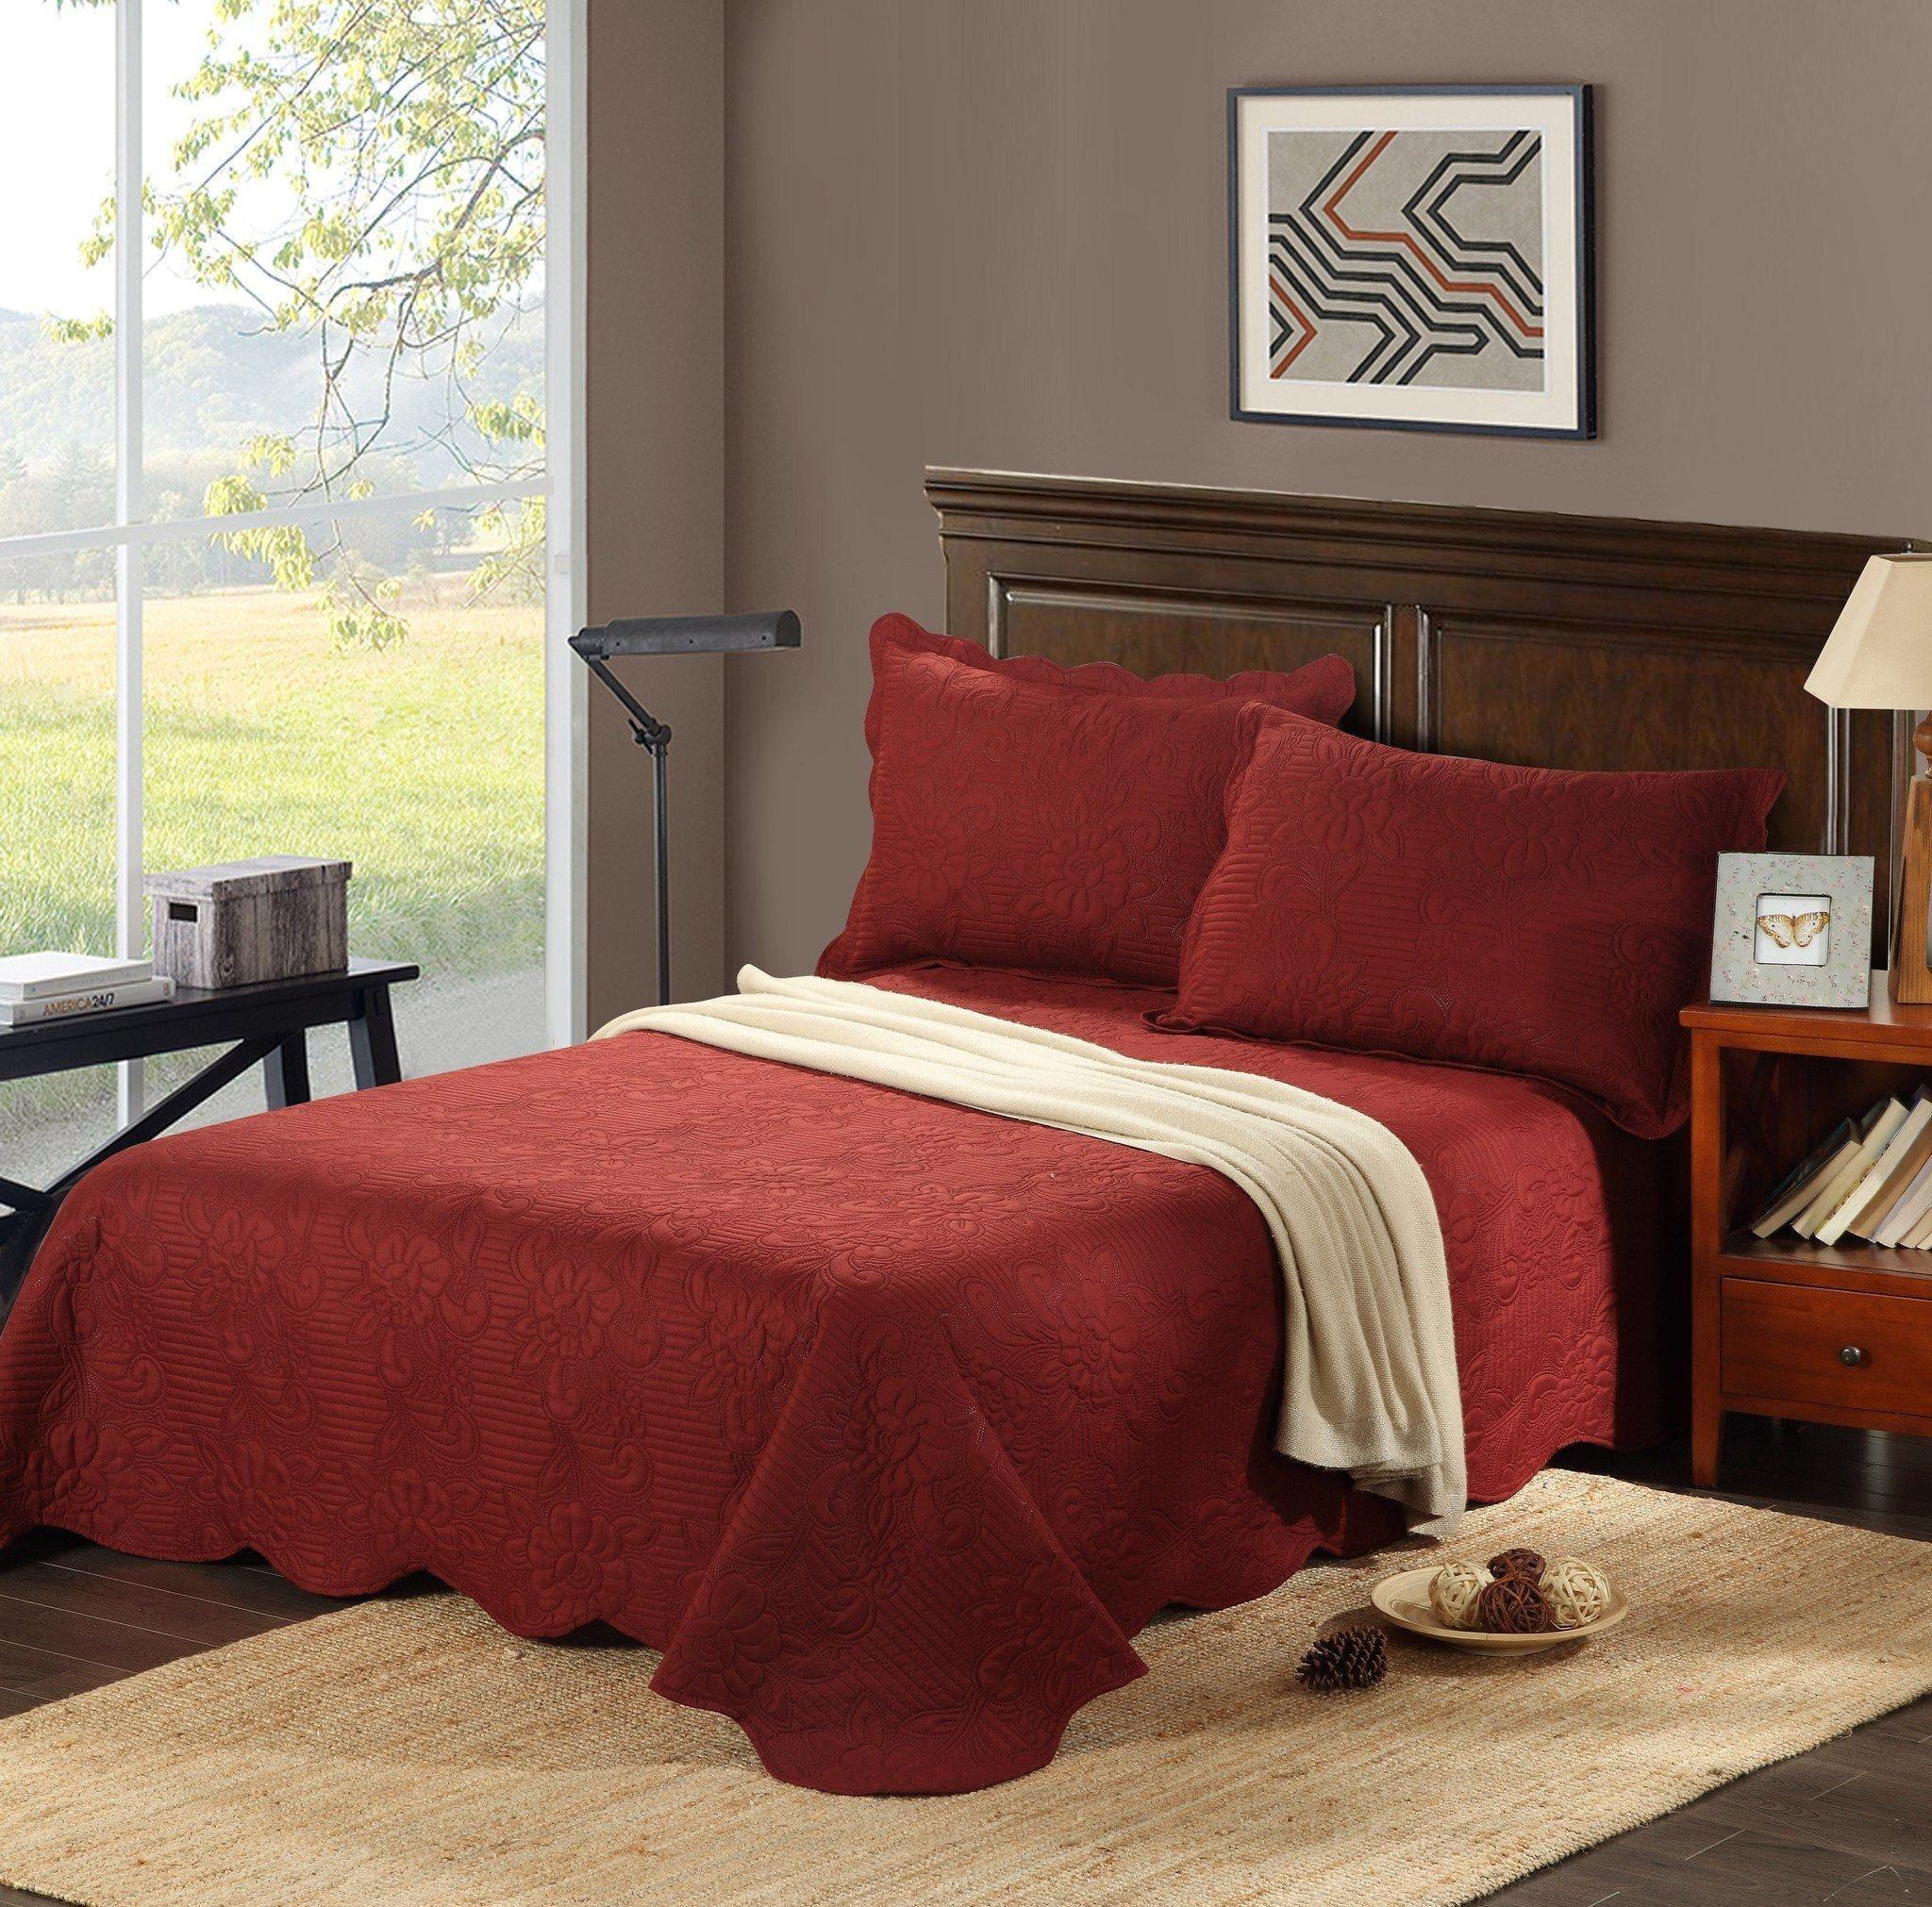 Burgundy and Gray Bedroom Best Of Tache Burgundy Autumn Marsala Bedspread Set Bju018